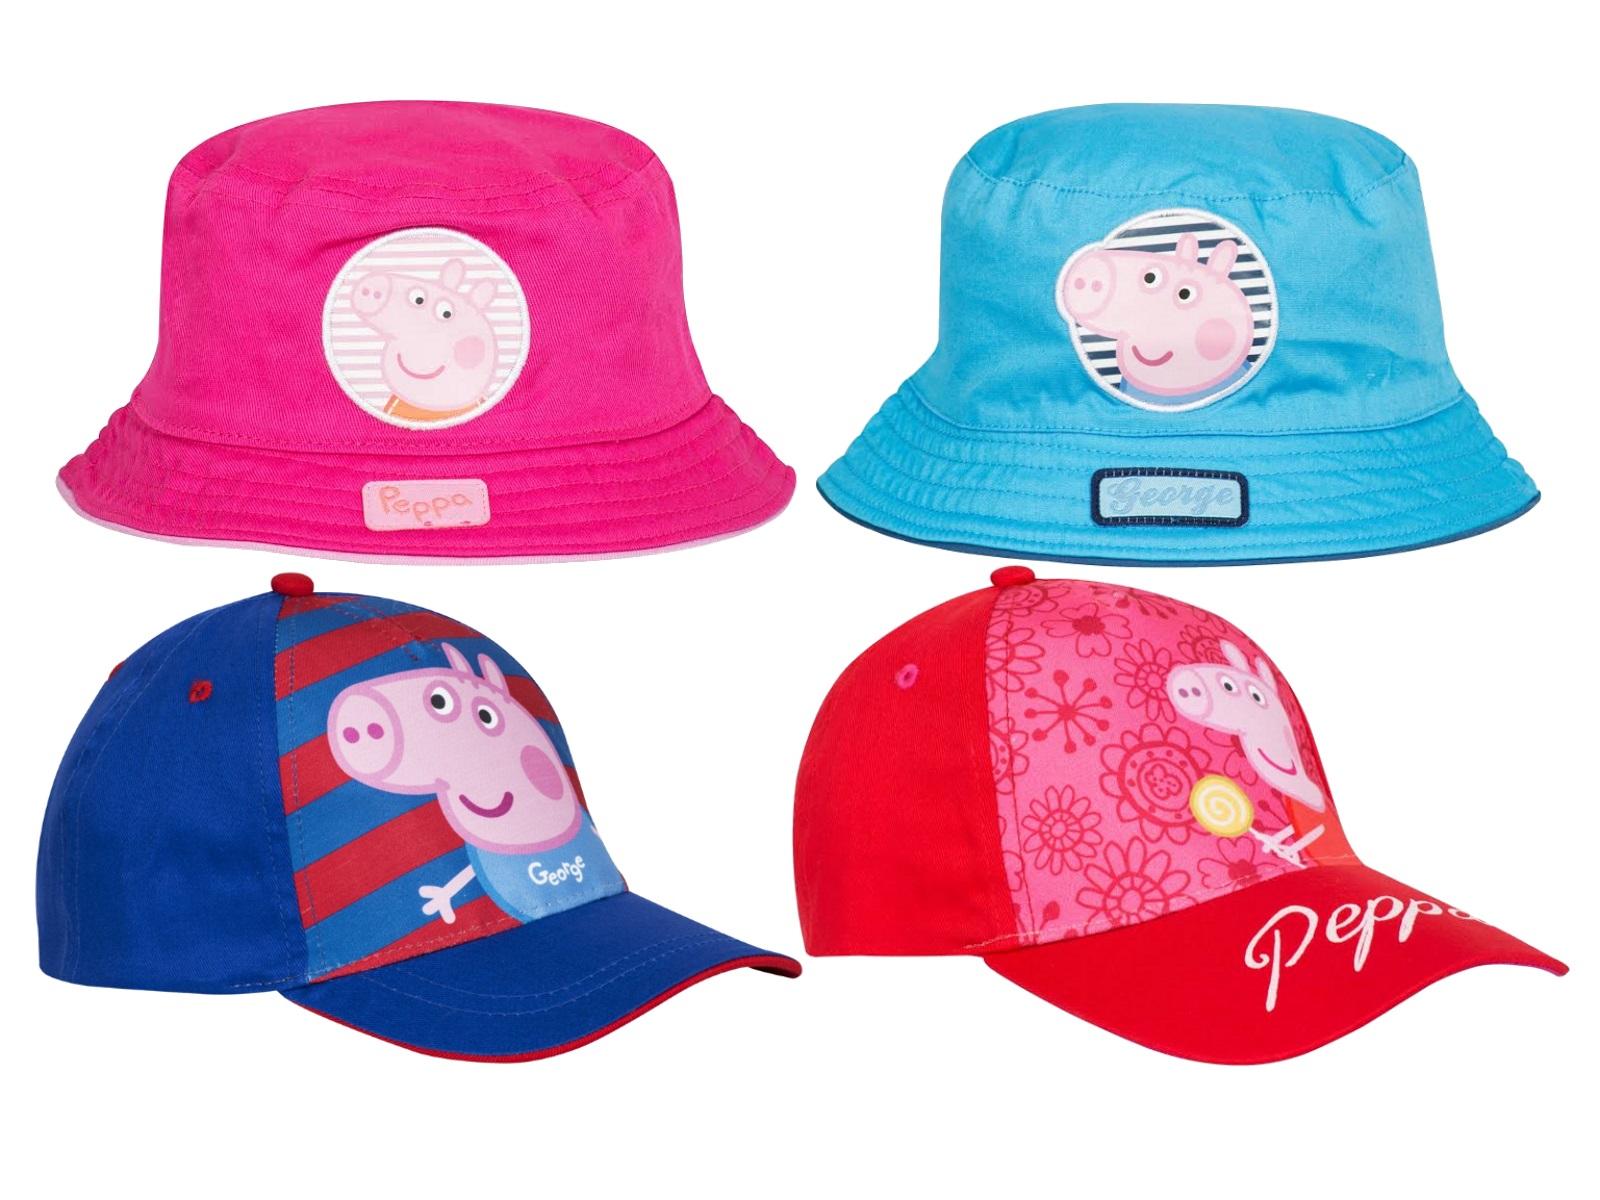 Boys Girls Peppa Pig Sun Hat George Summer Baseball Peak Cap Childrens Size  S-XL 30678437d06